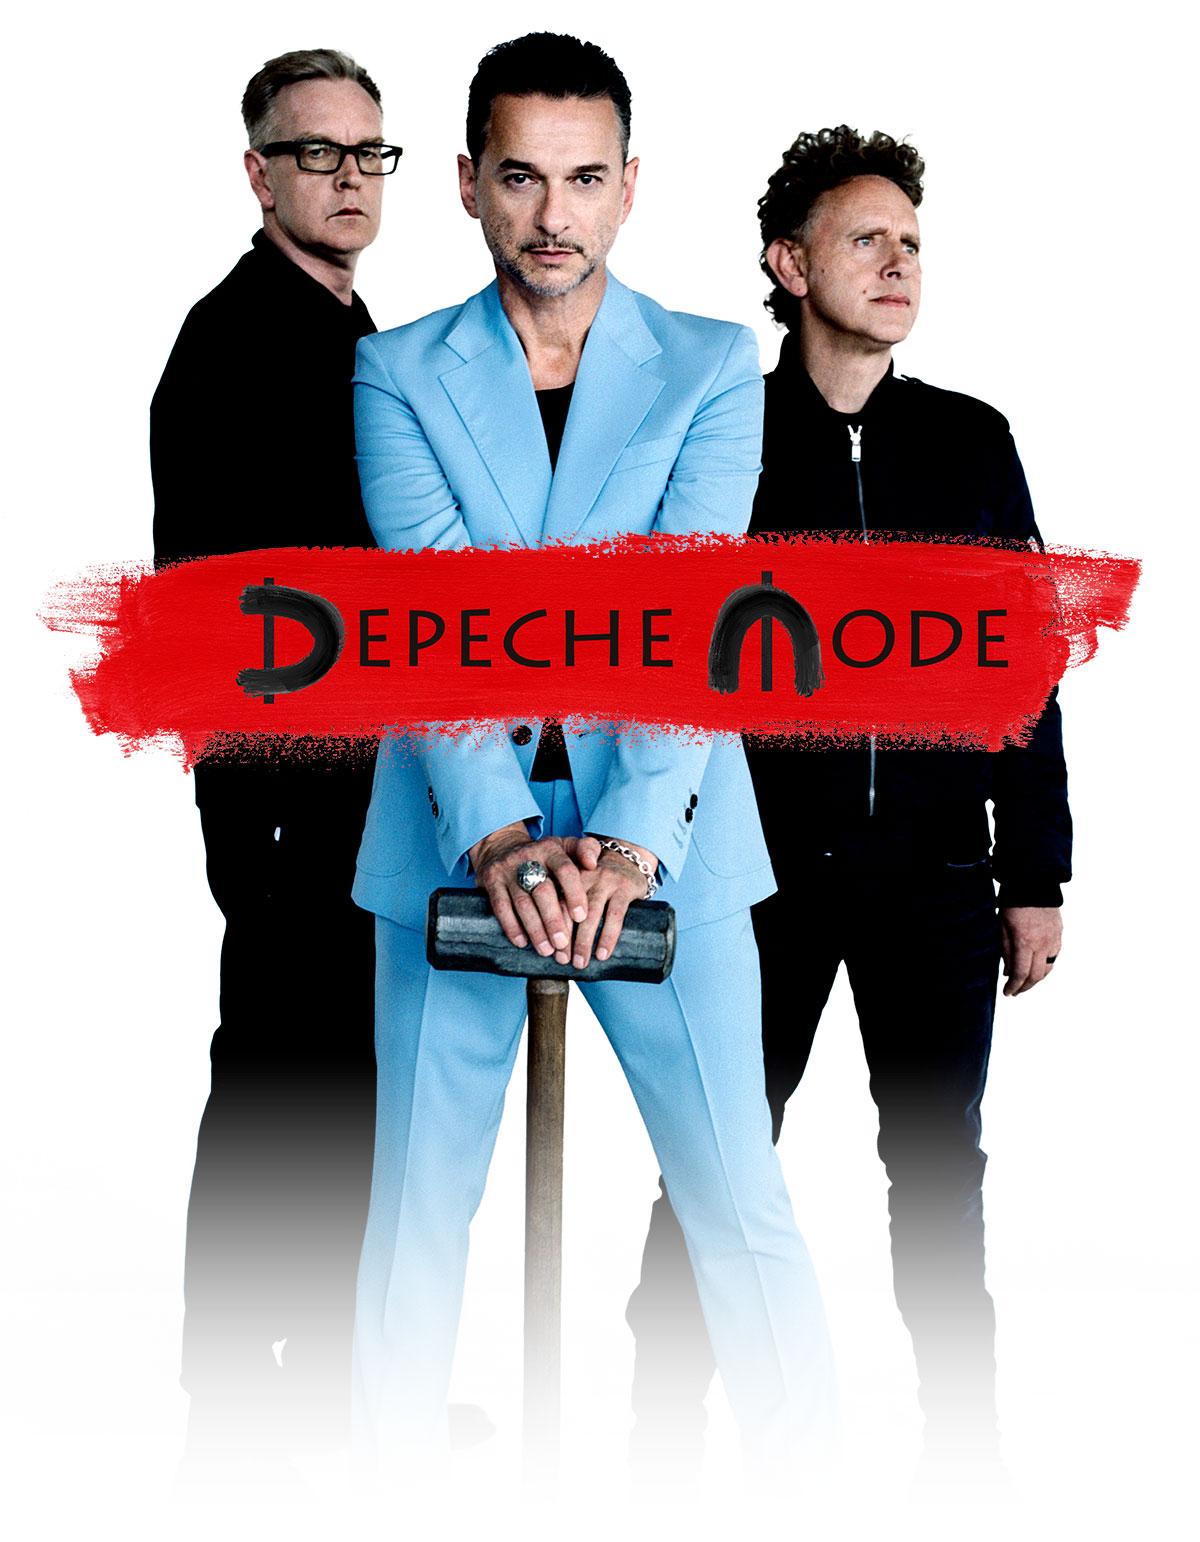 Concierto Depeche Mode - Santiago de Chile 2018